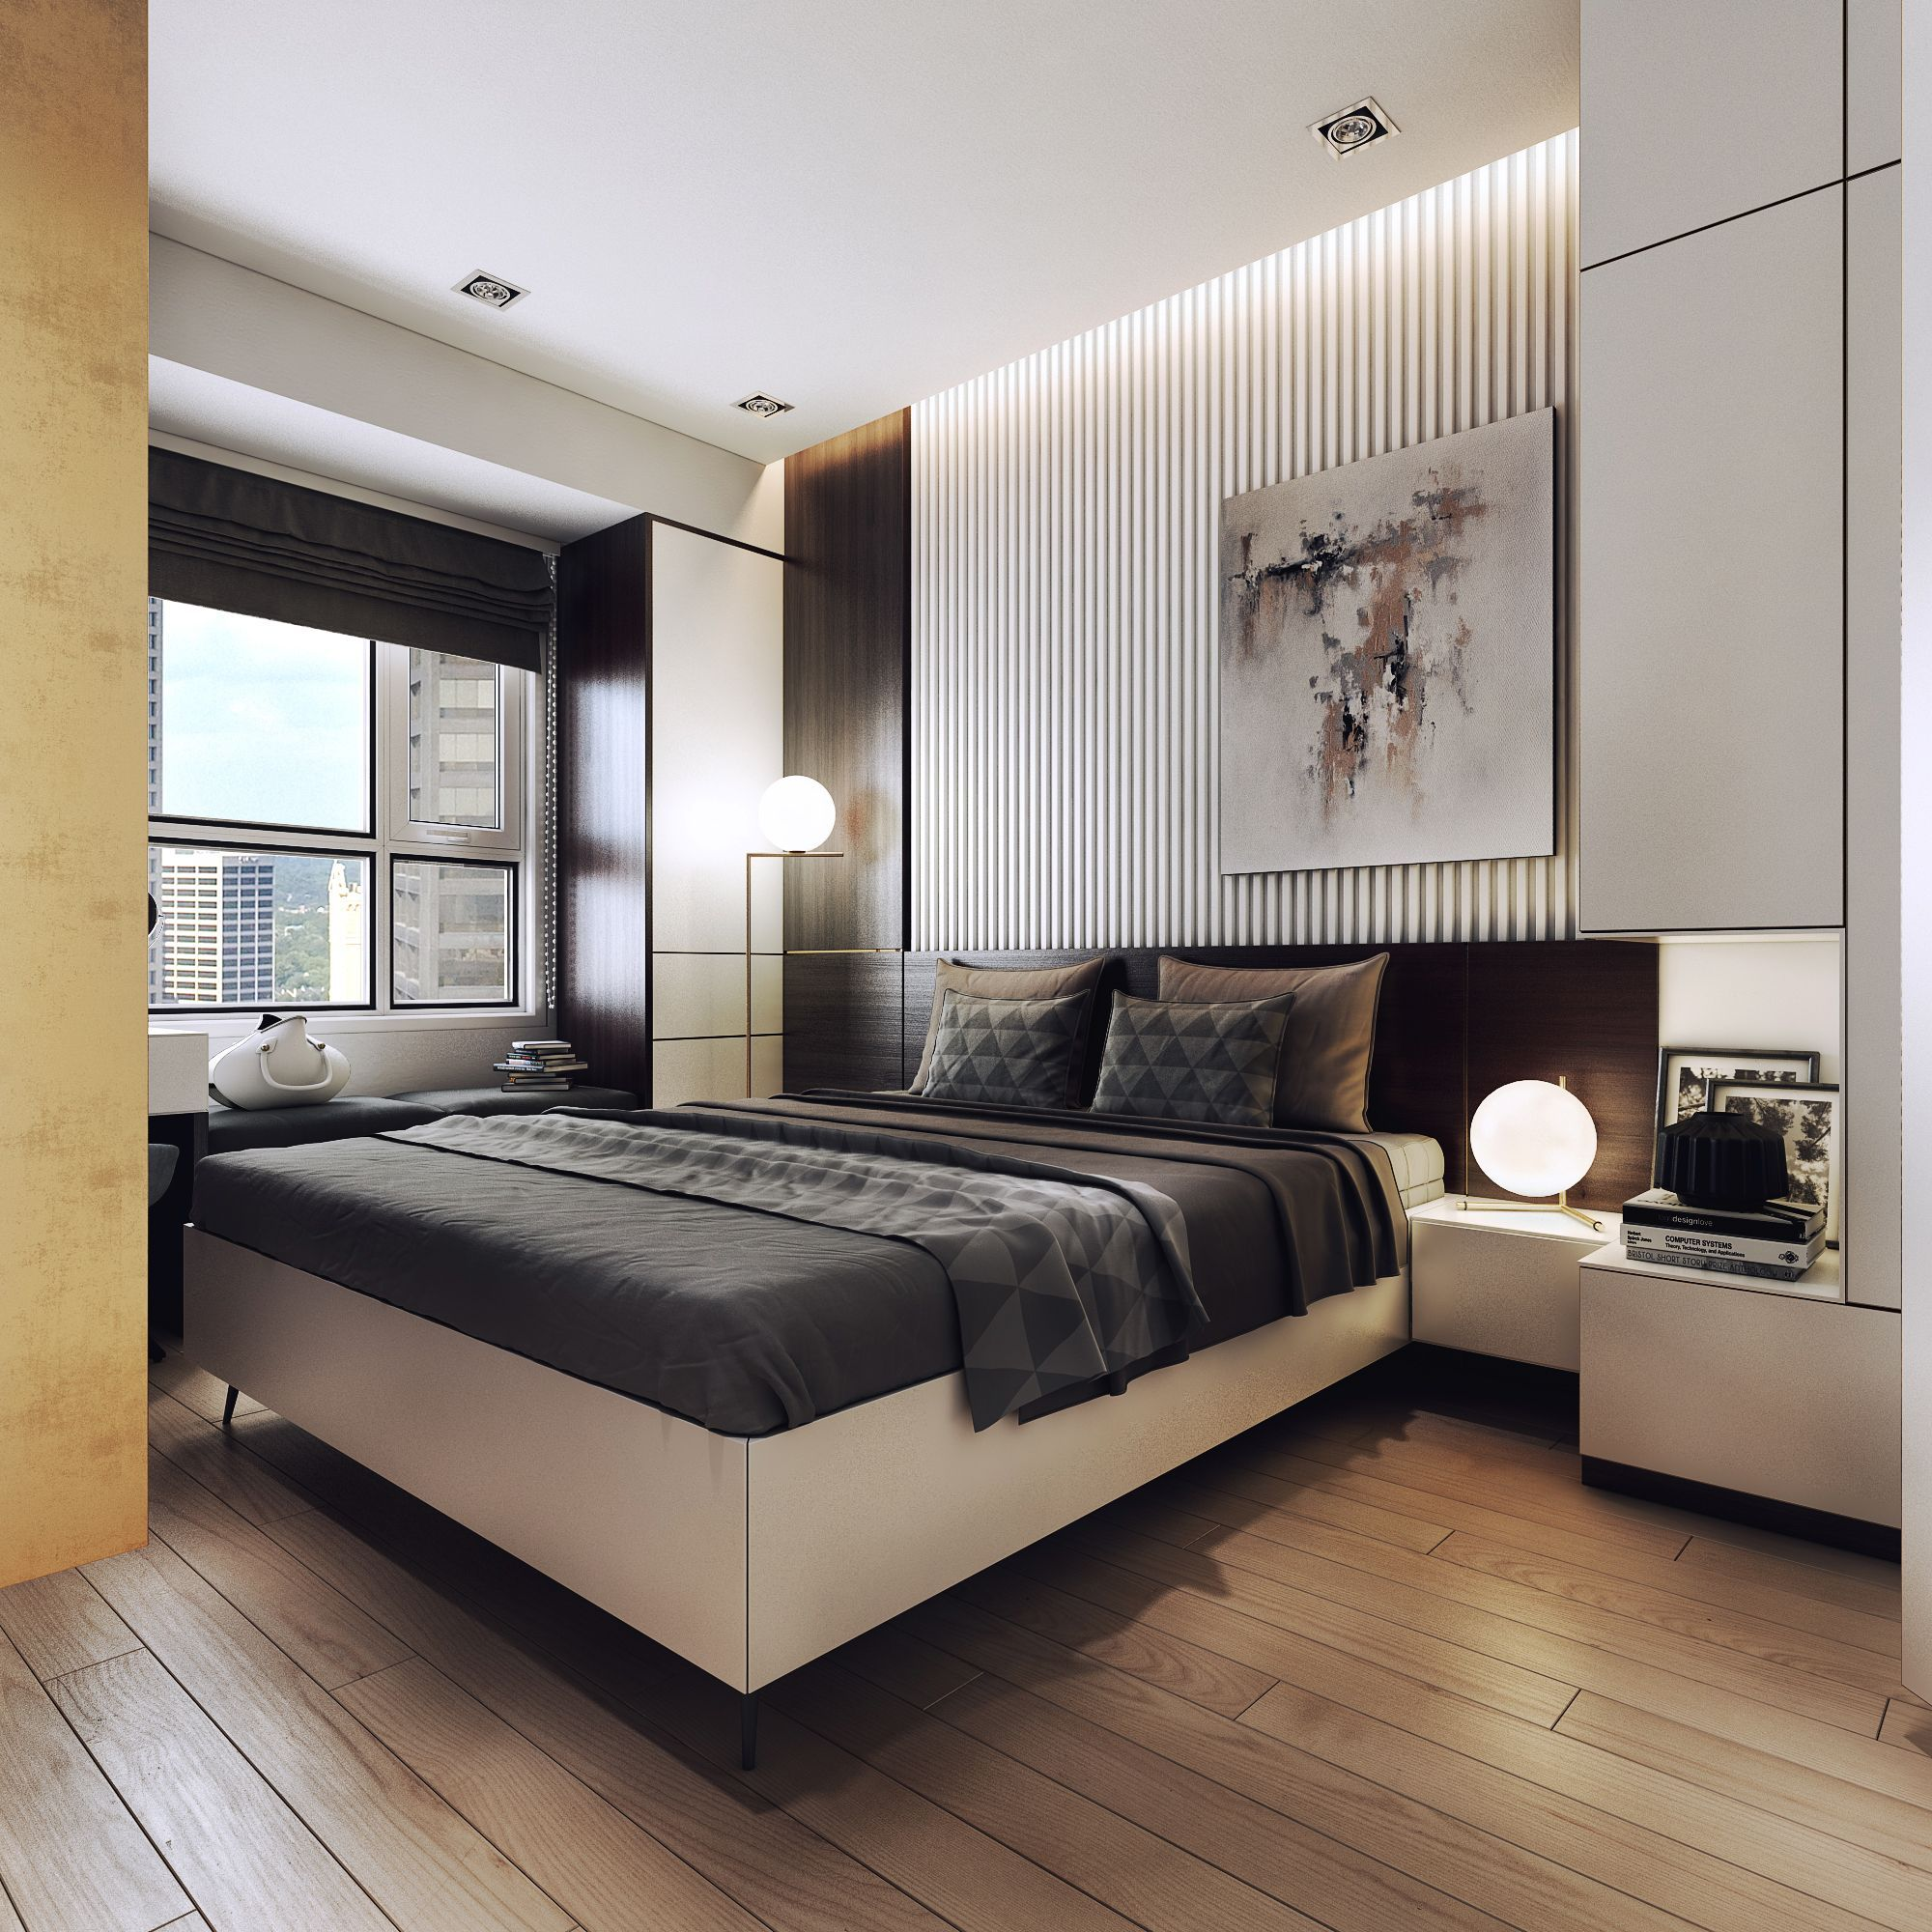 Luxury Apartment Interior Design Ideas With The Right Concept